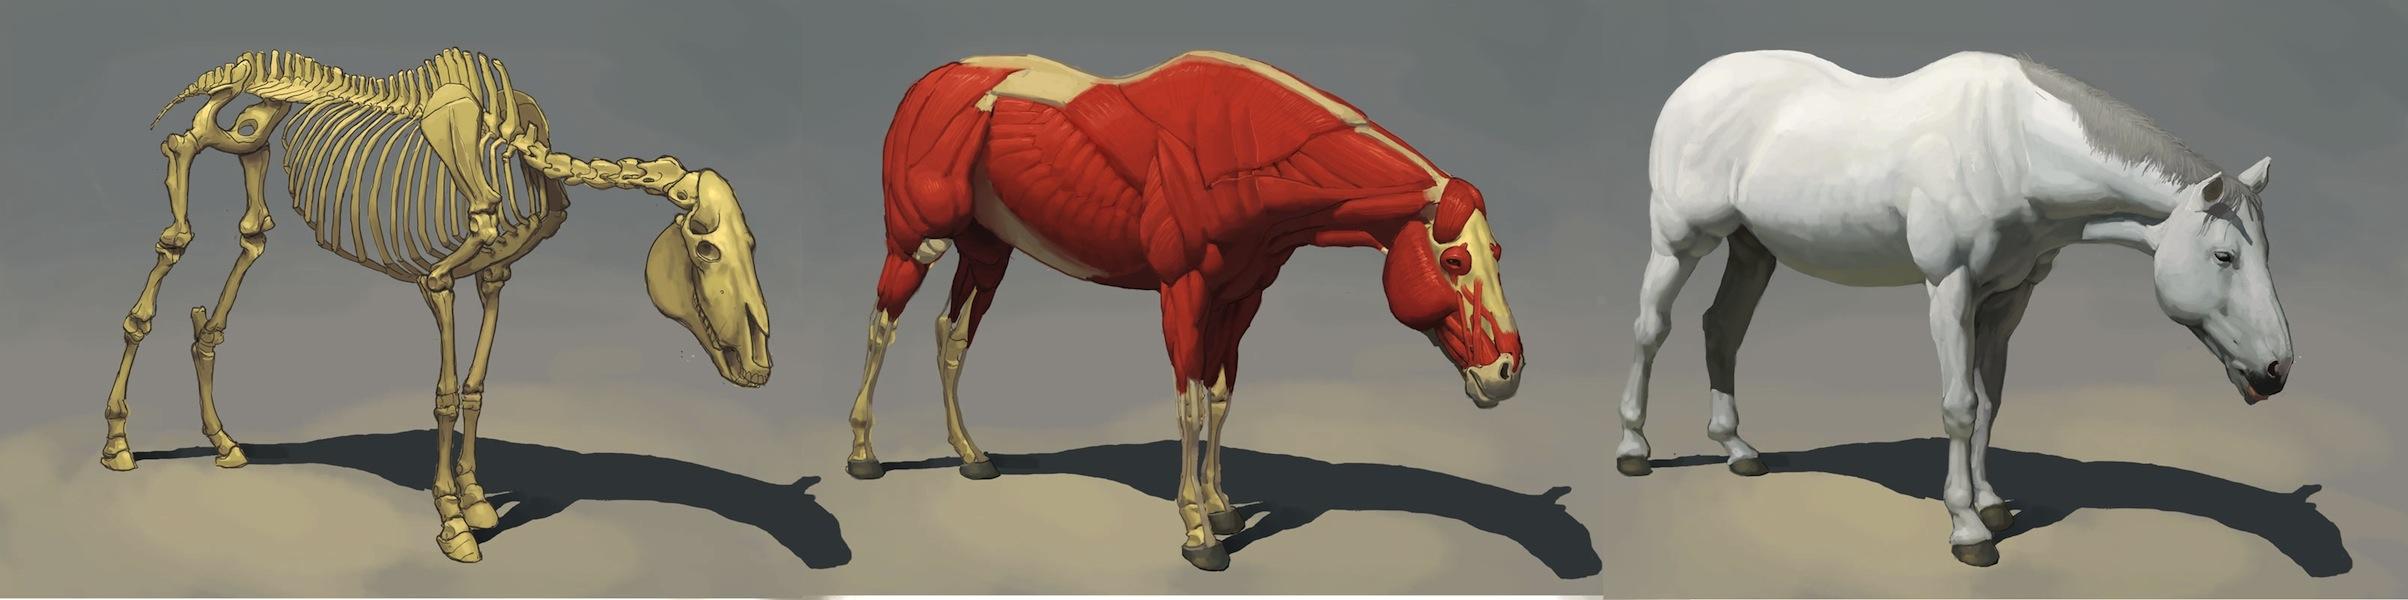 Horse anatomy by awesomeplex